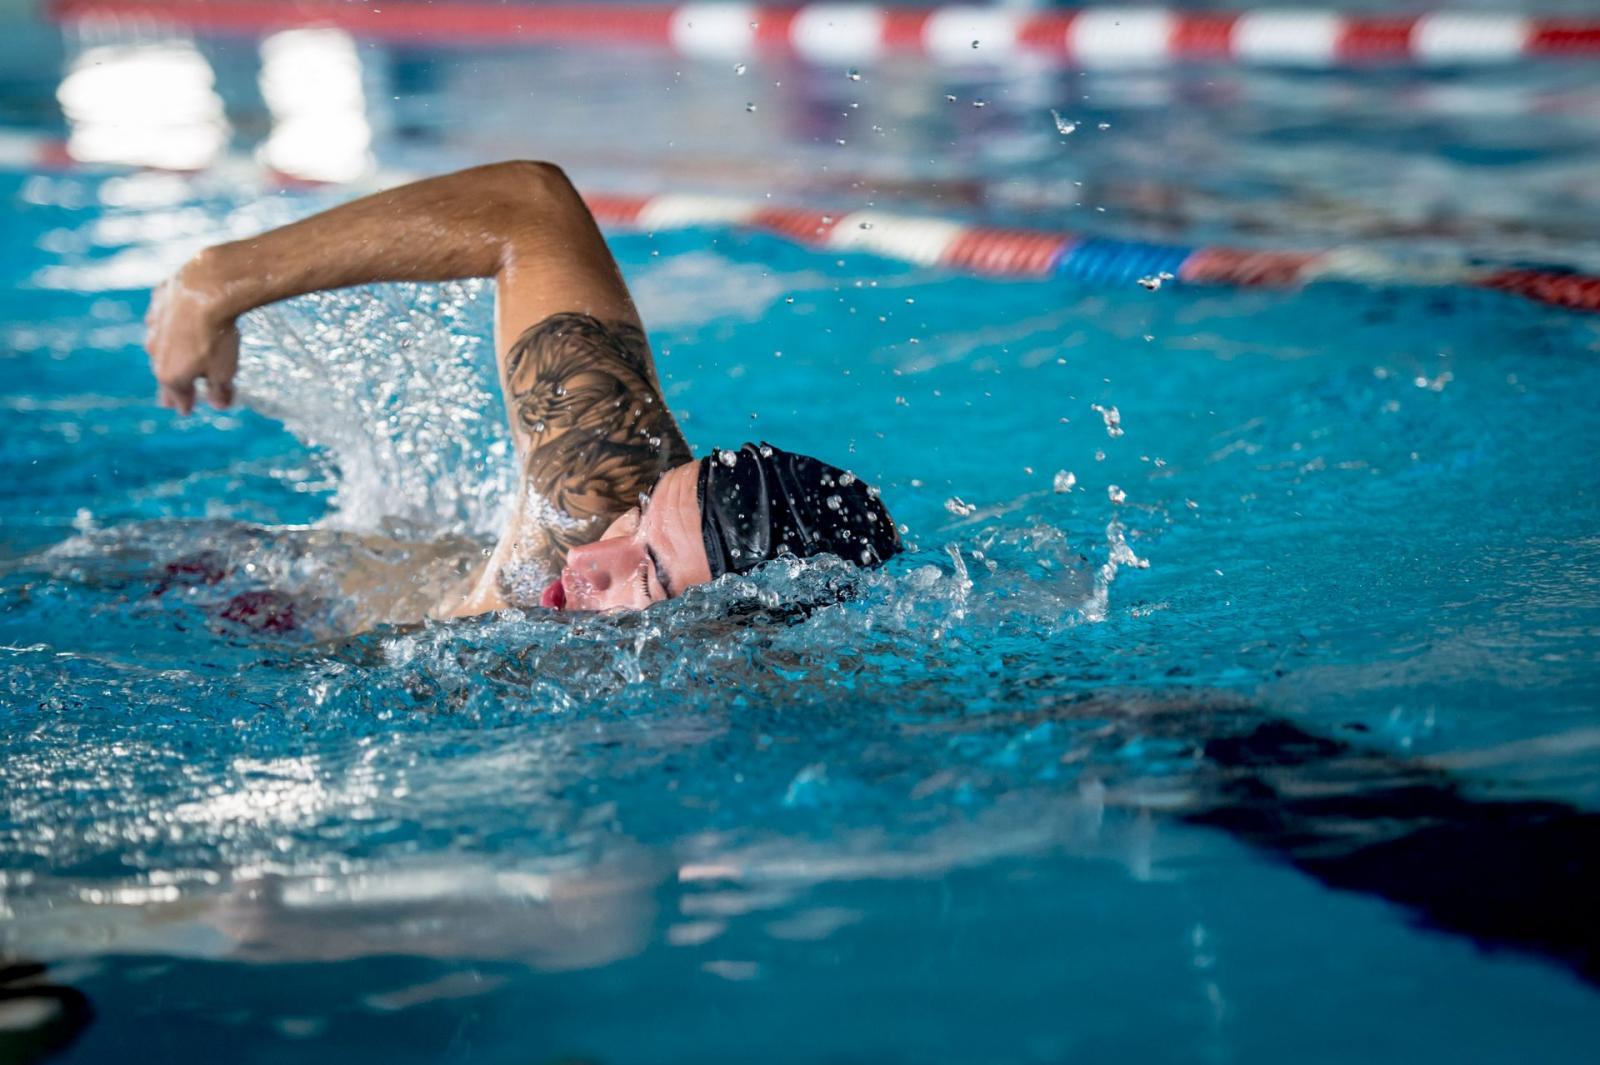 8 swimming lanes of 25 meters of lenght